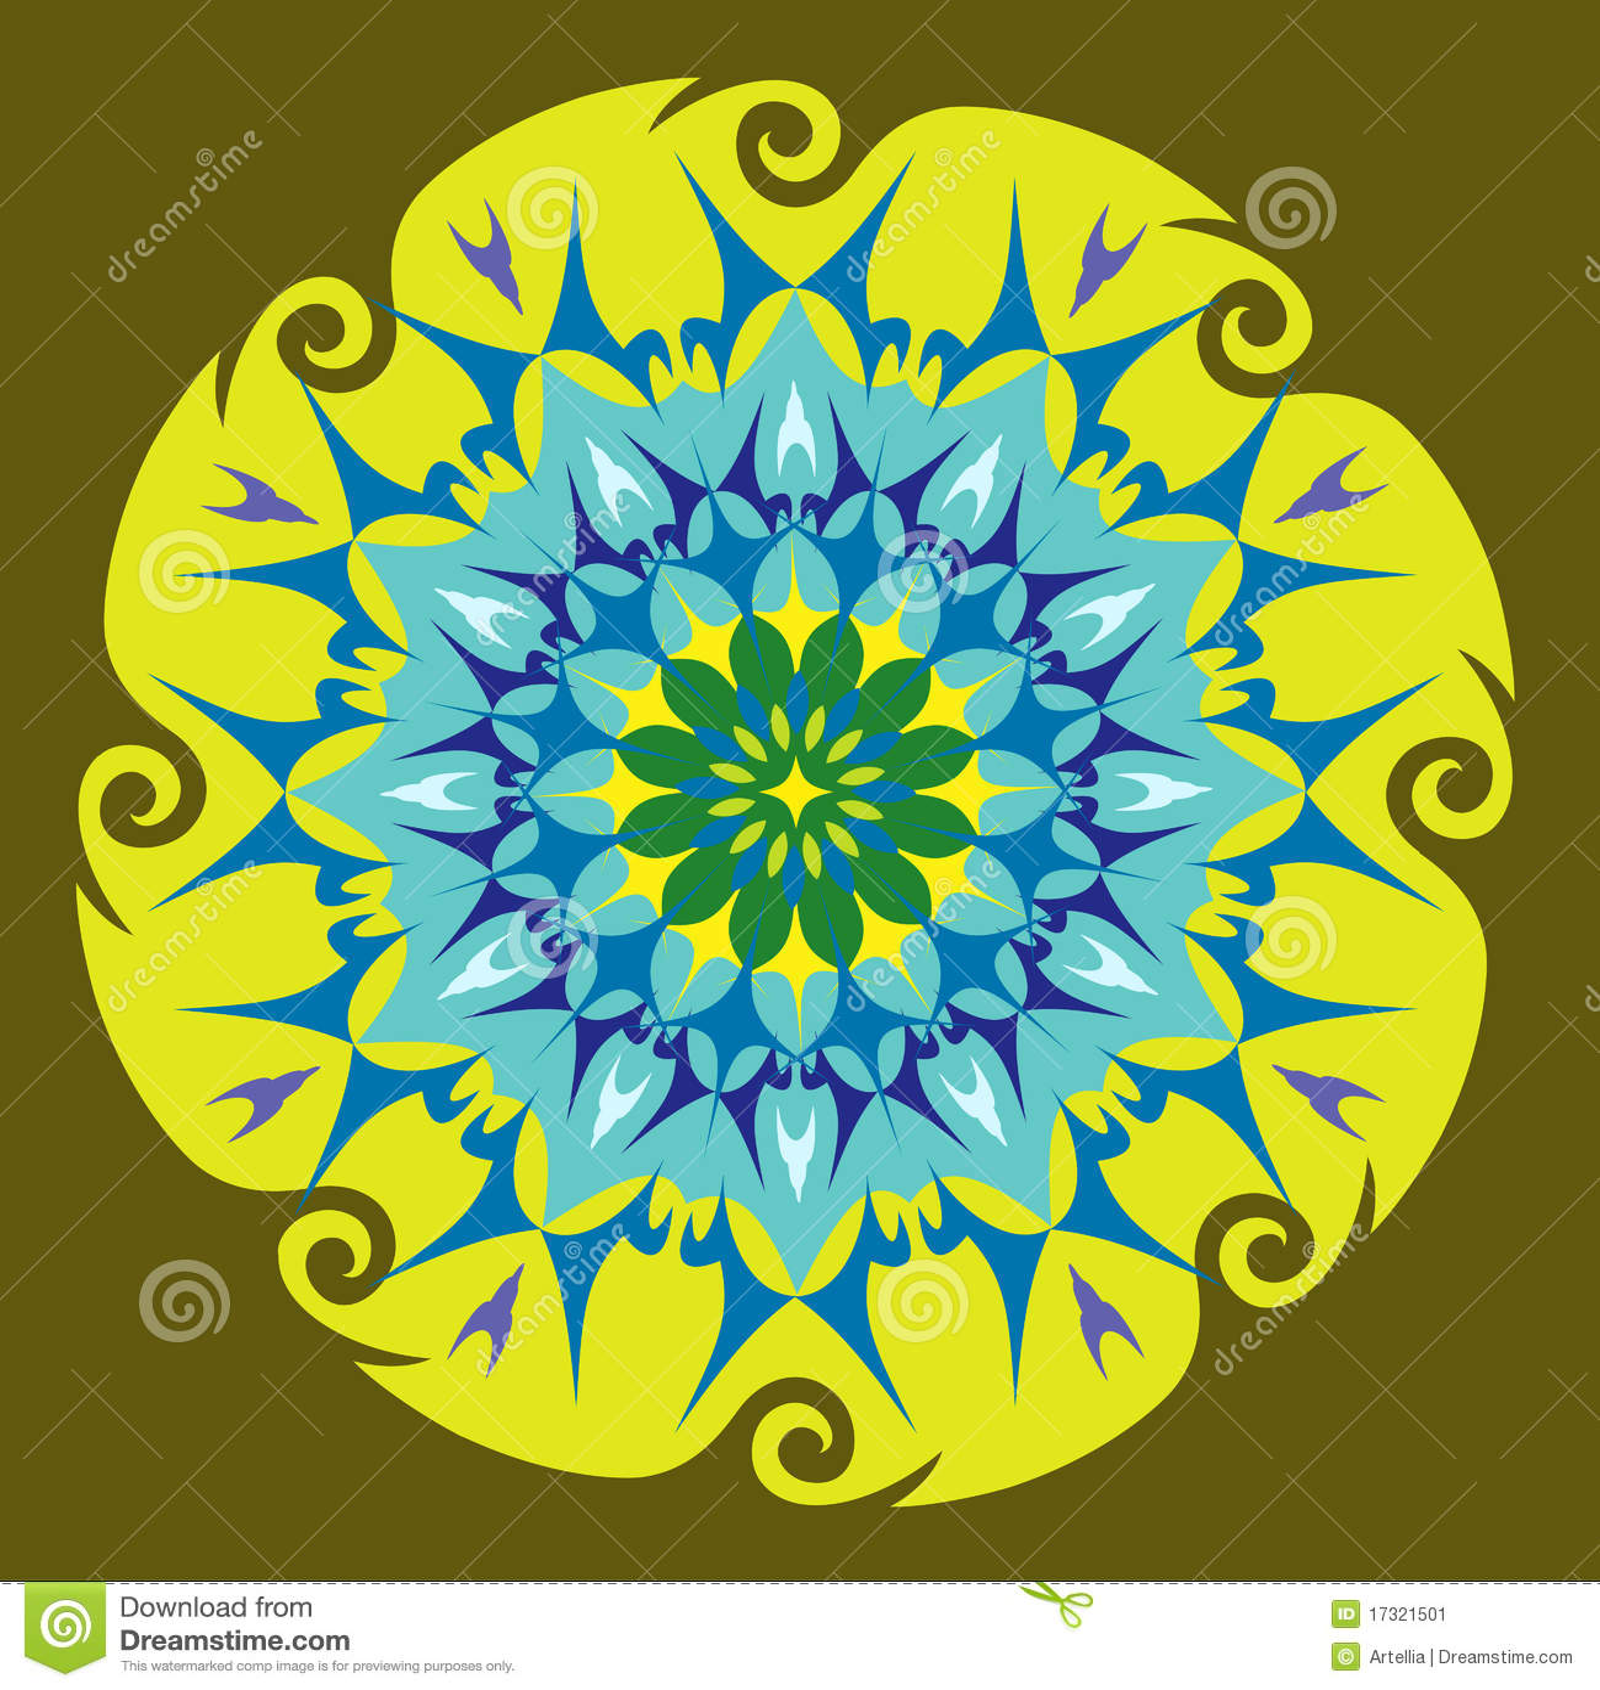 Mandala da energia em cores verdes